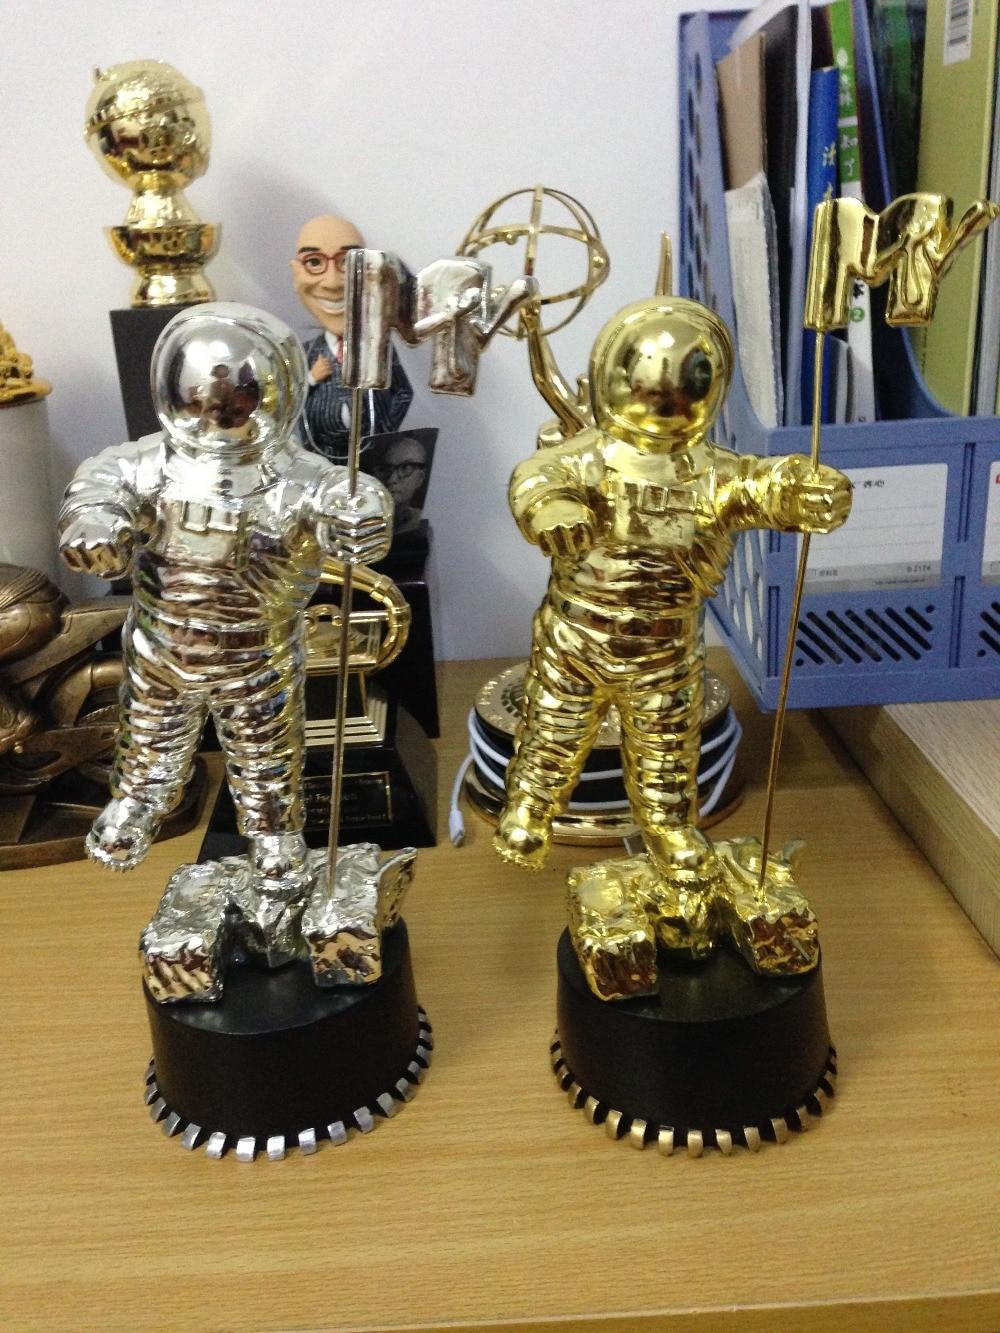 Gold MTV Awards, American MTV Awards, Moonman Trophy Awards, Gold MTV - Home Decor - Photo 4